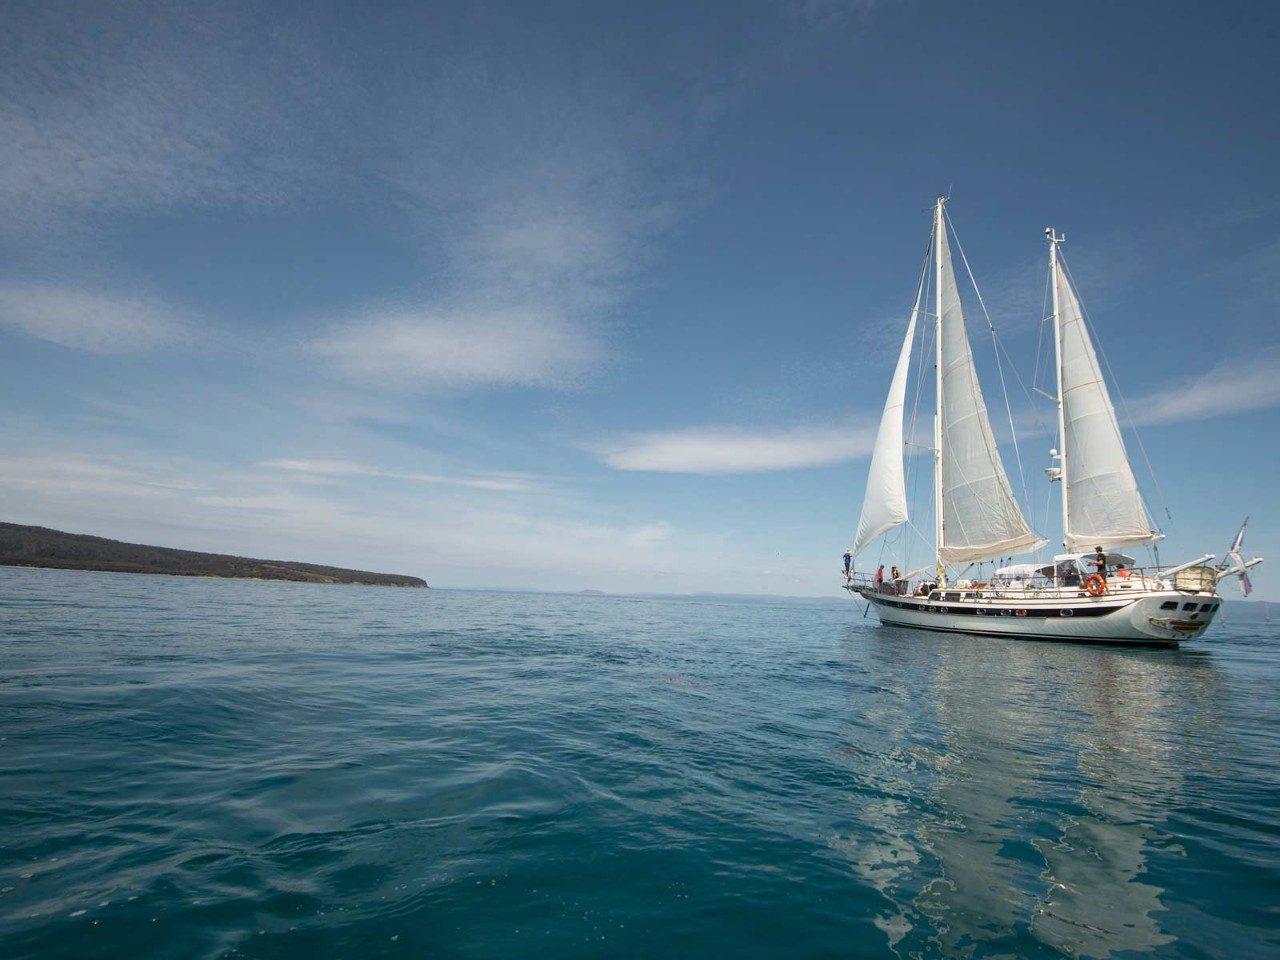 Serenely Bush Sails On Across Sea Of >> What It S Like Aboard A Luxury Tasmanian Vessel Travel Insider